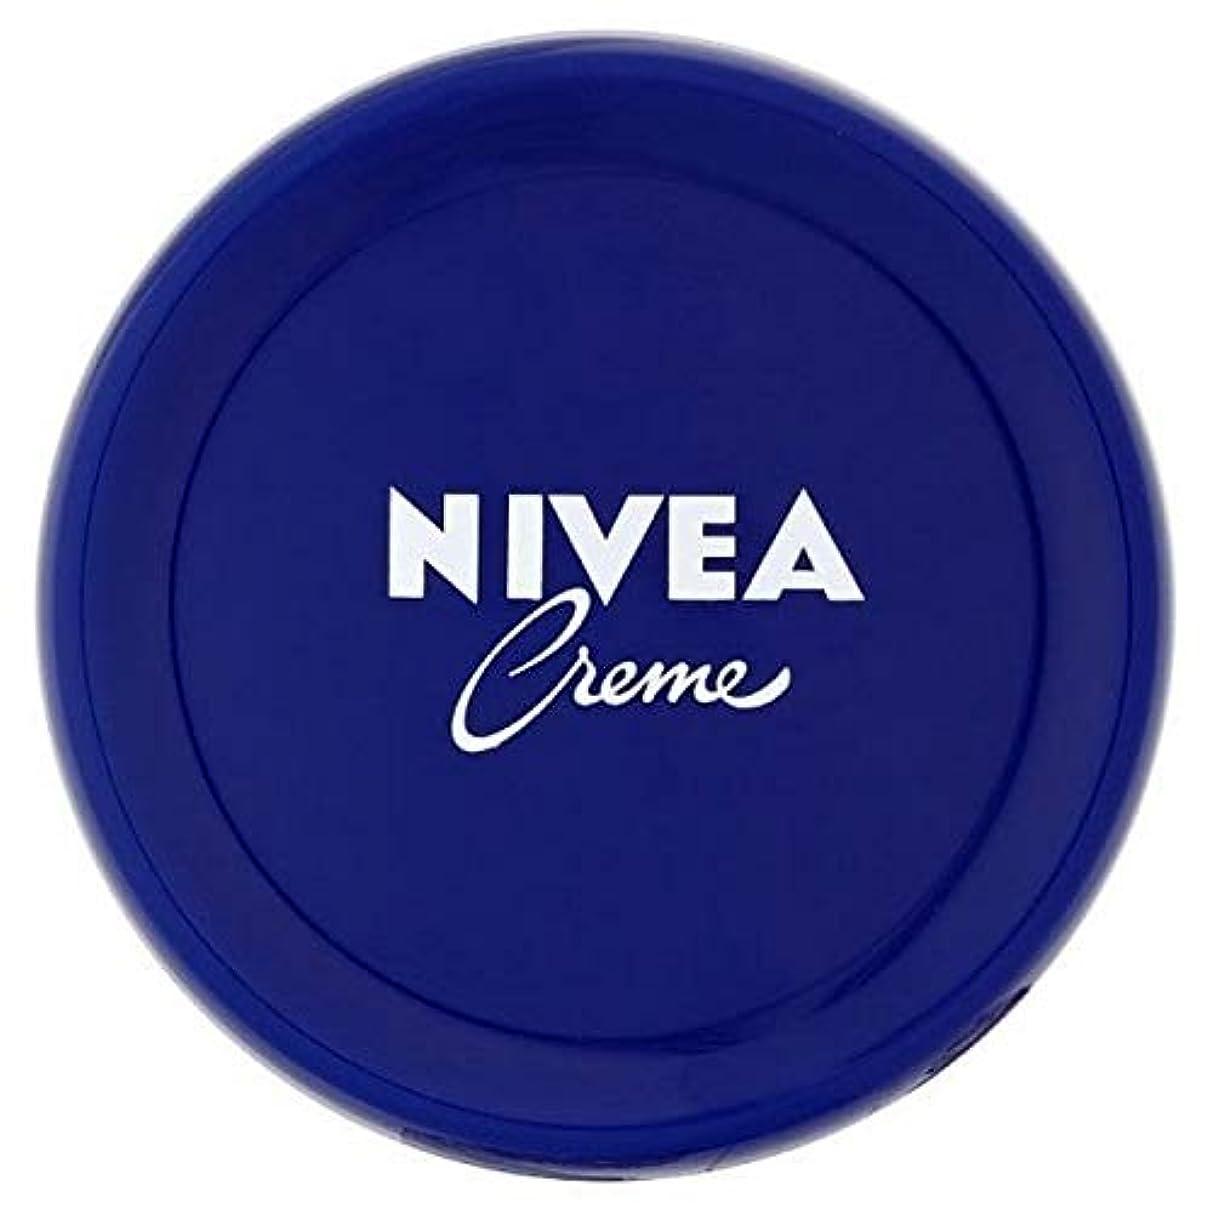 [Nivea ] ニベアクリーム万能ボディクリーム、200ミリリットル - NIVEA Creme All Purpose Body Cream, 200ml [並行輸入品]